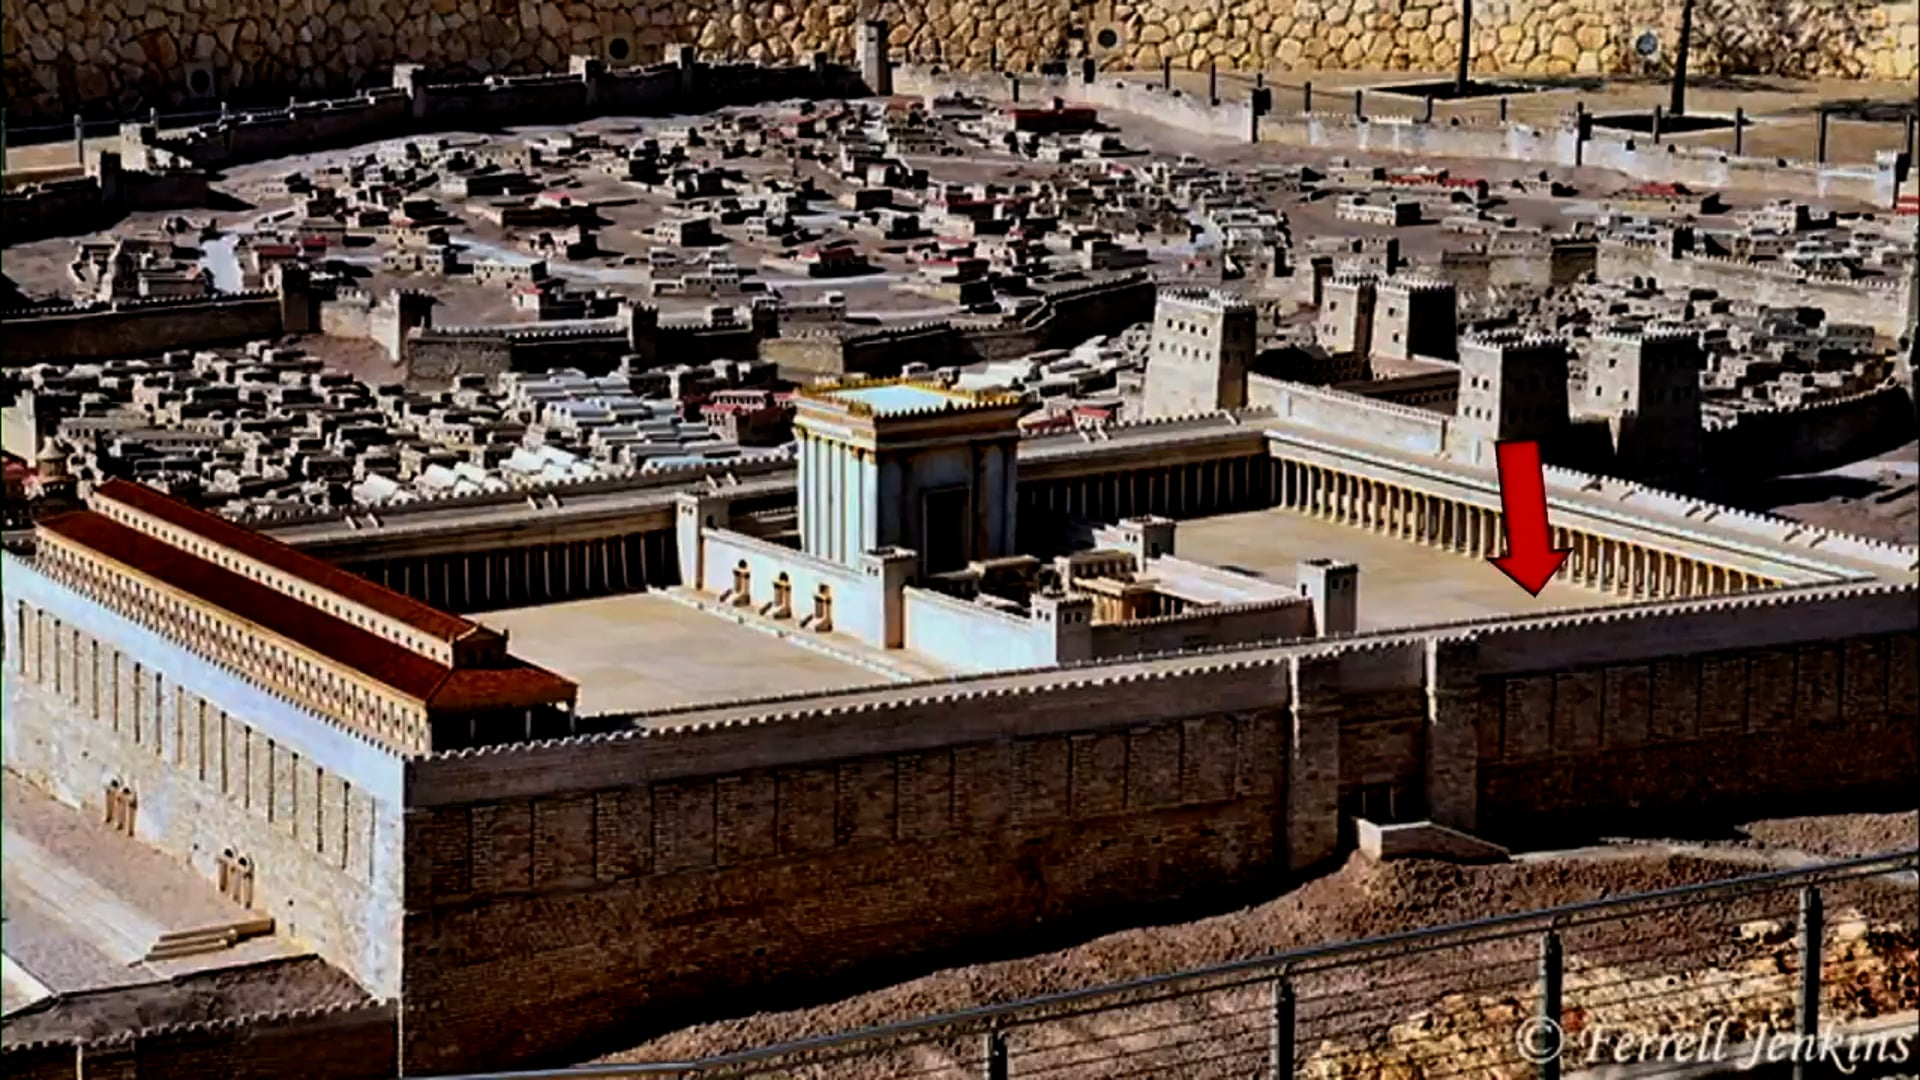 In Search of the Real Jesus - Tabernacle/Jewish Leaders - Menorah (Messiah)